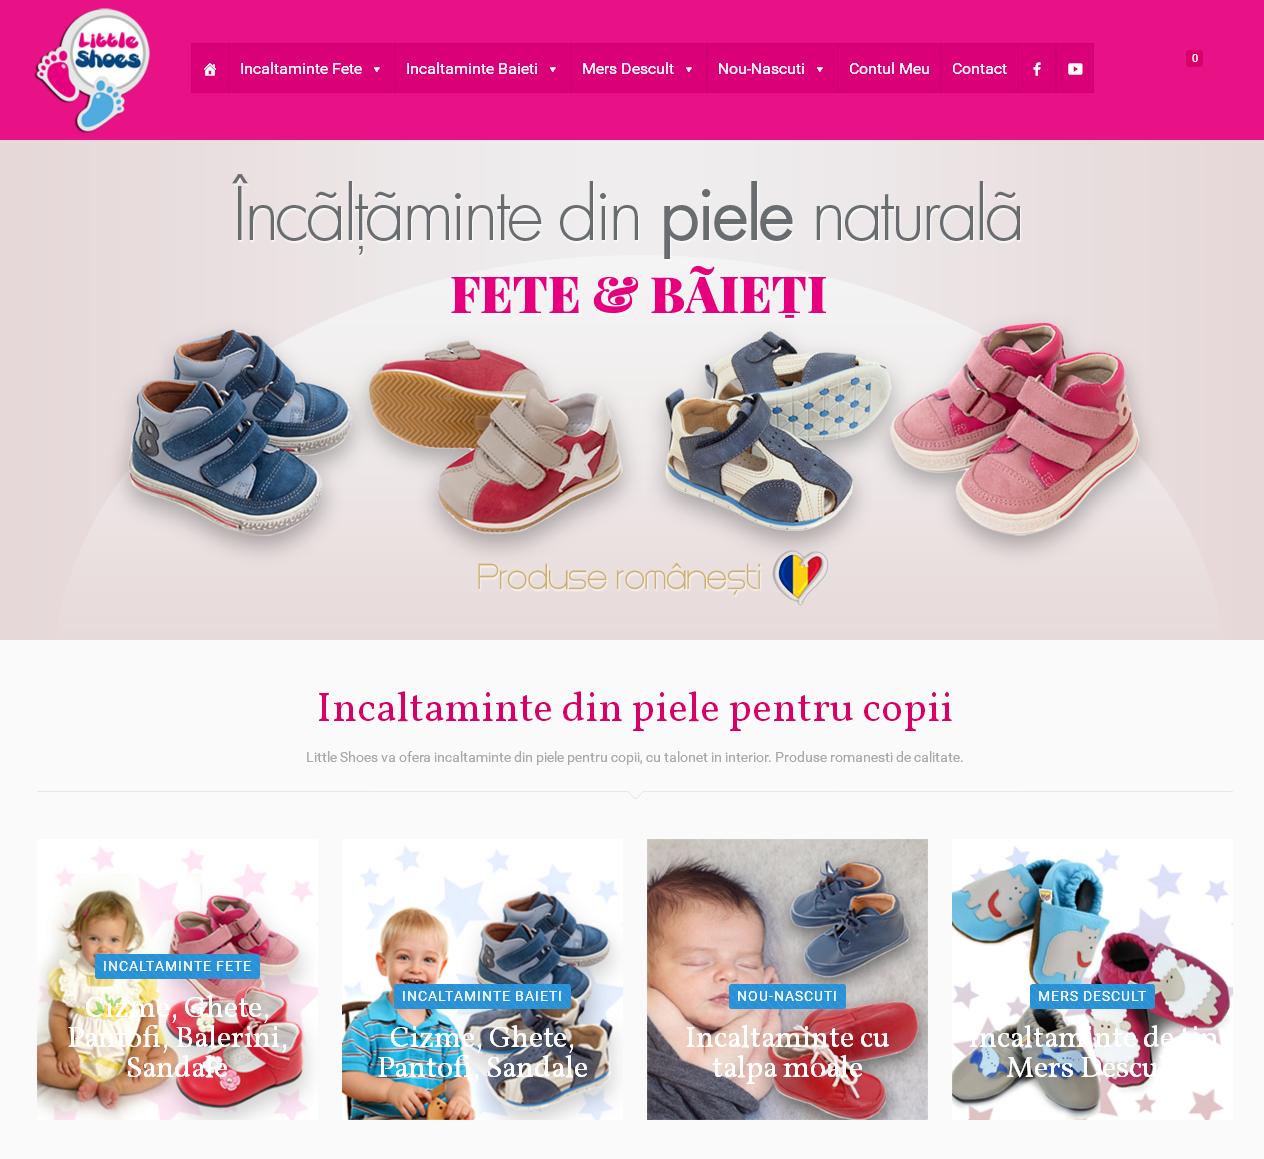 littleshoes.ro - Magazin Online